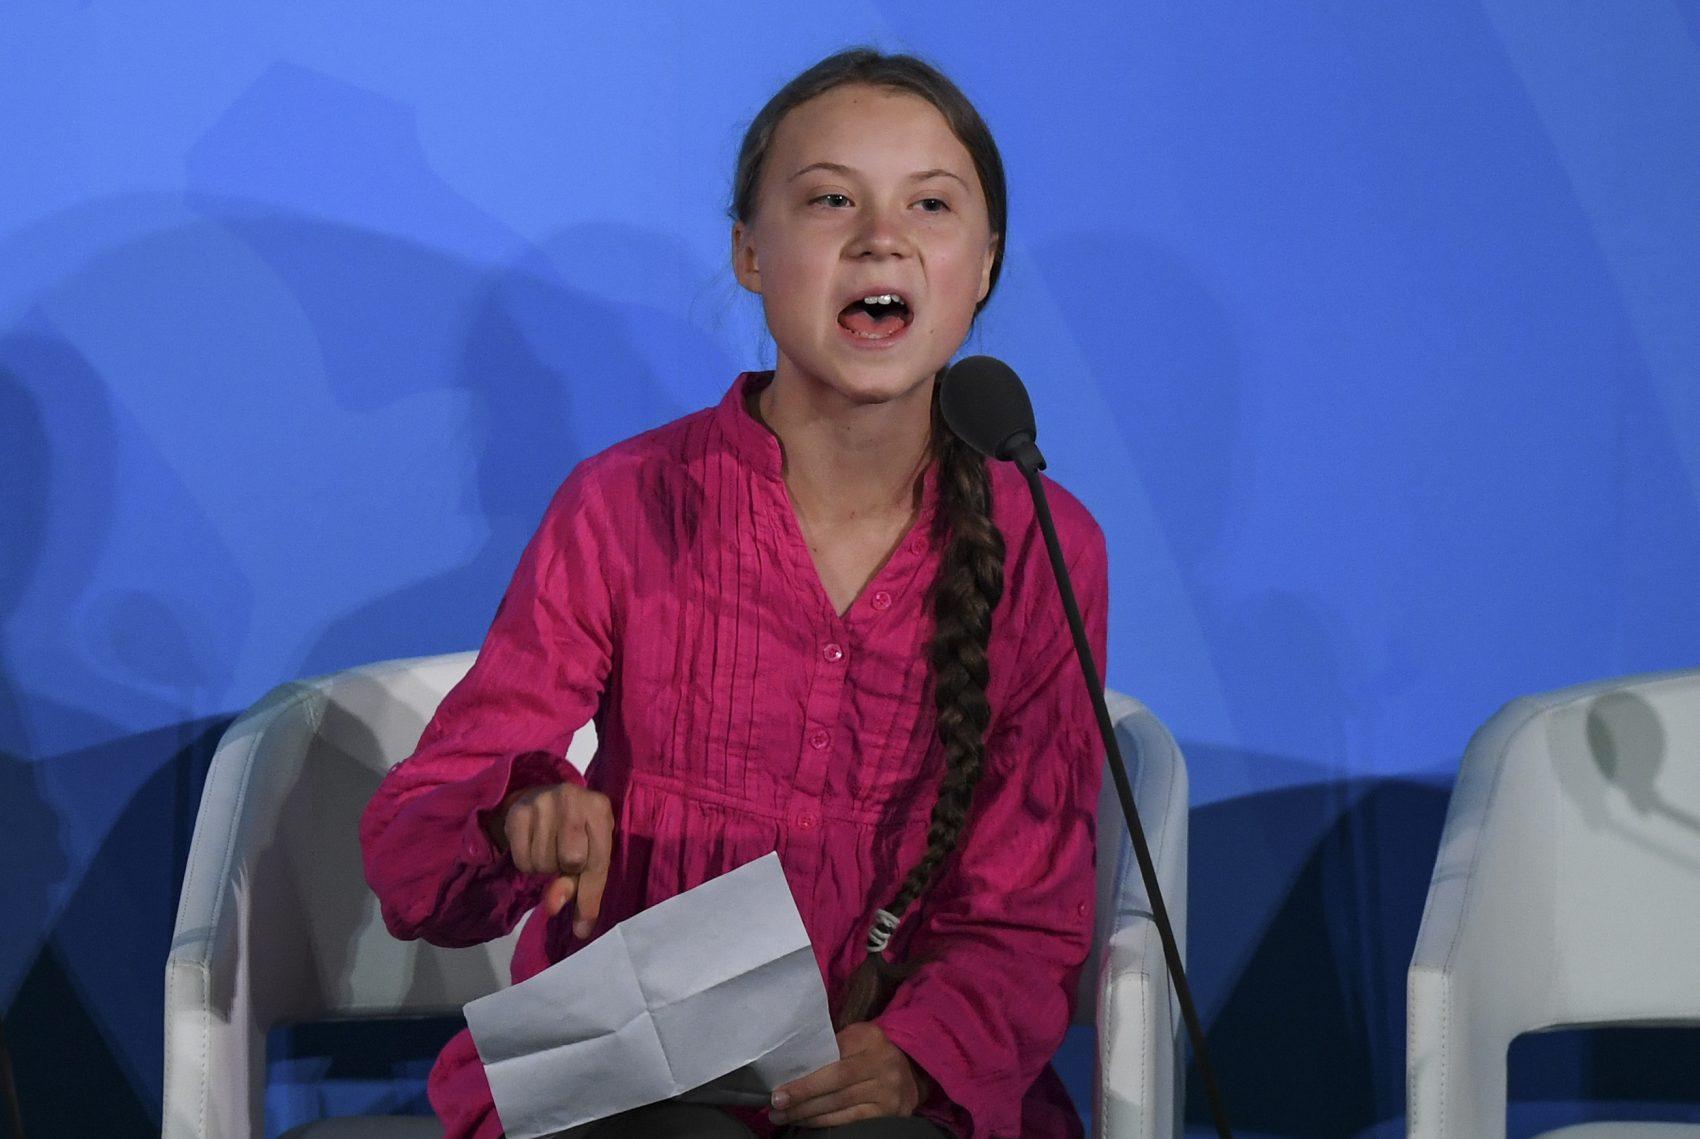 A ativista sueca Greta Thunberg discursa durante a Cúpula do Clima na ONU no dia 23 de setembro (Foto: Timothy A. Clary / AFP)